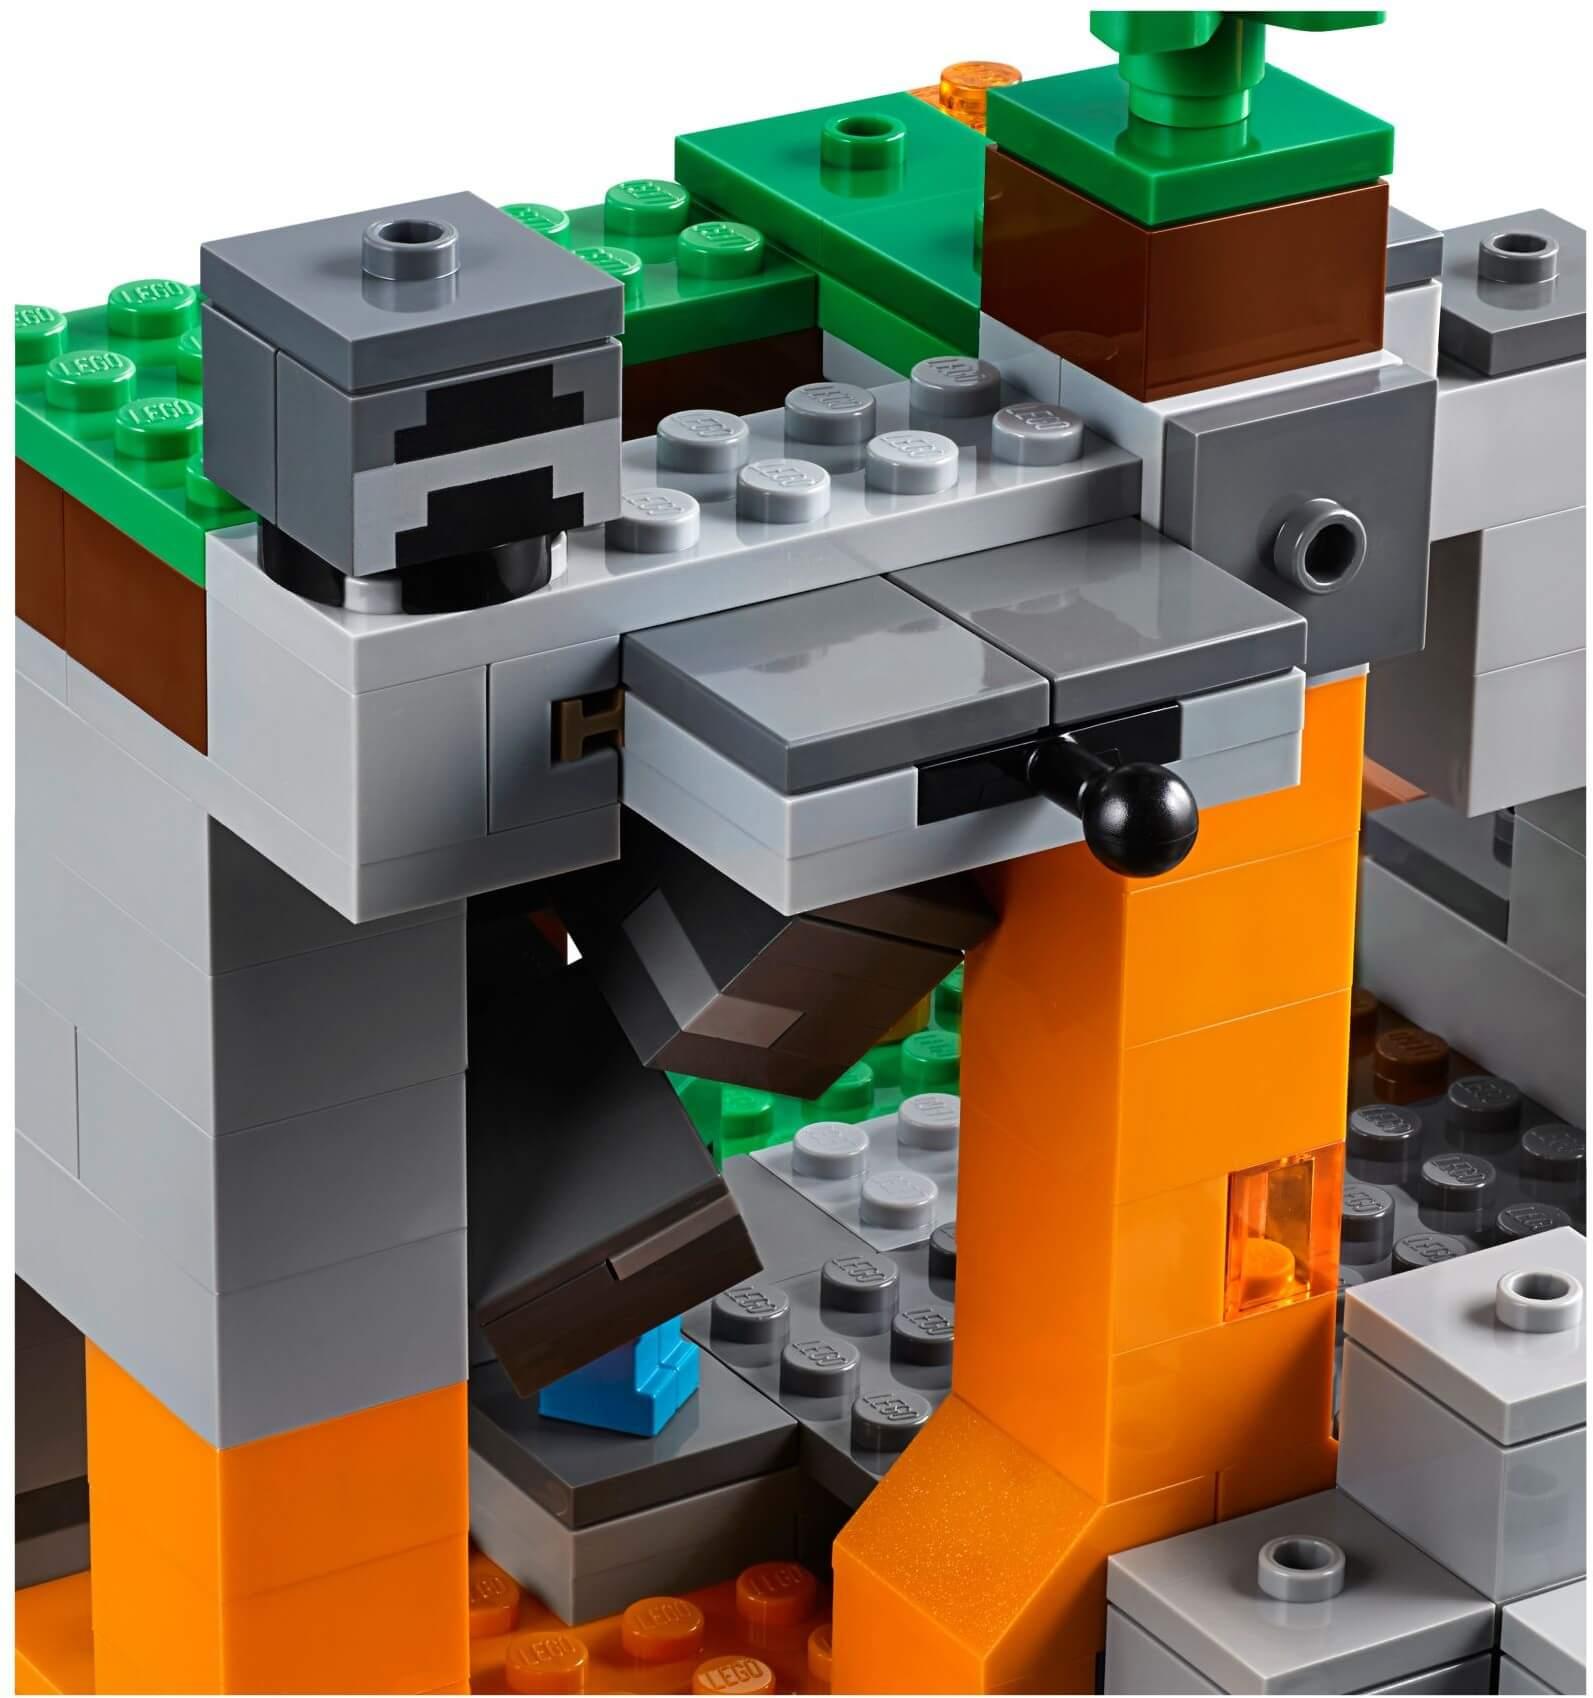 Mua đồ chơi LEGO 21141 - LEGO Minecraft 21141 - Hang Động Zombie (LEGO Minecraft 21141 The Zombie Cave)